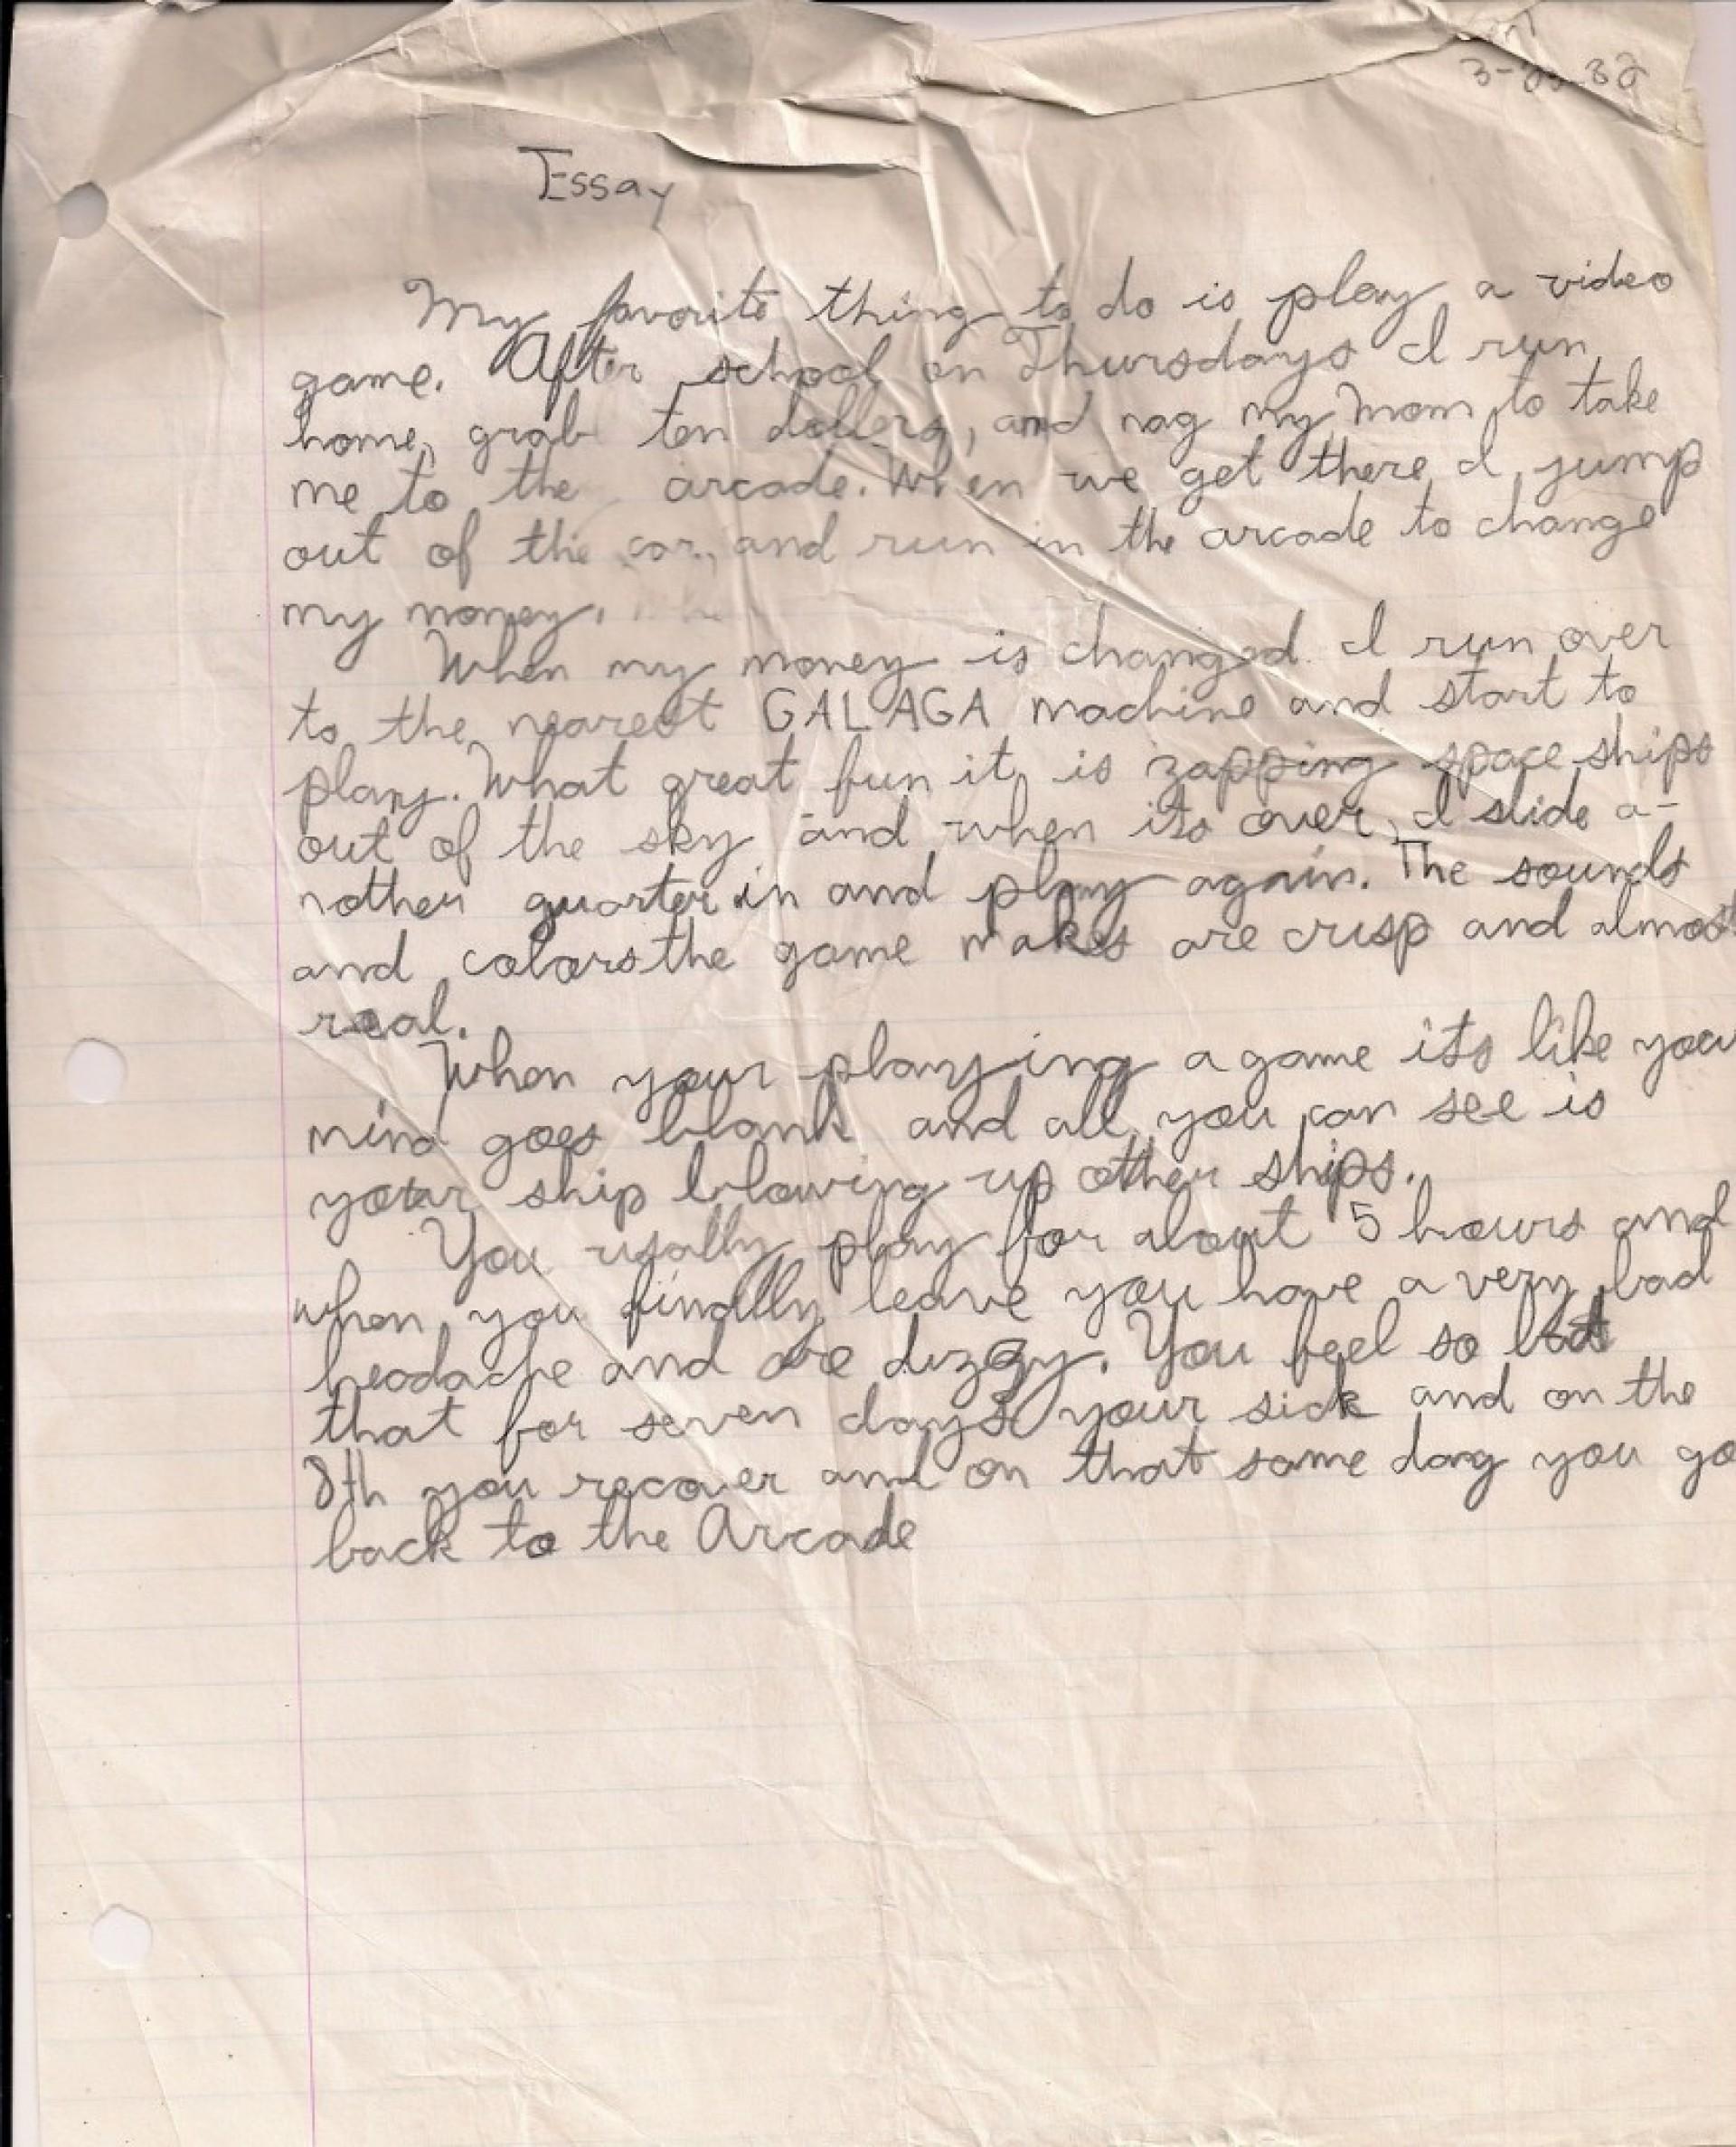 013 My Hobby Essay Example Videogameessay1982 Impressive In Urdu Class 7 Hindi Cricket Marathi 1920